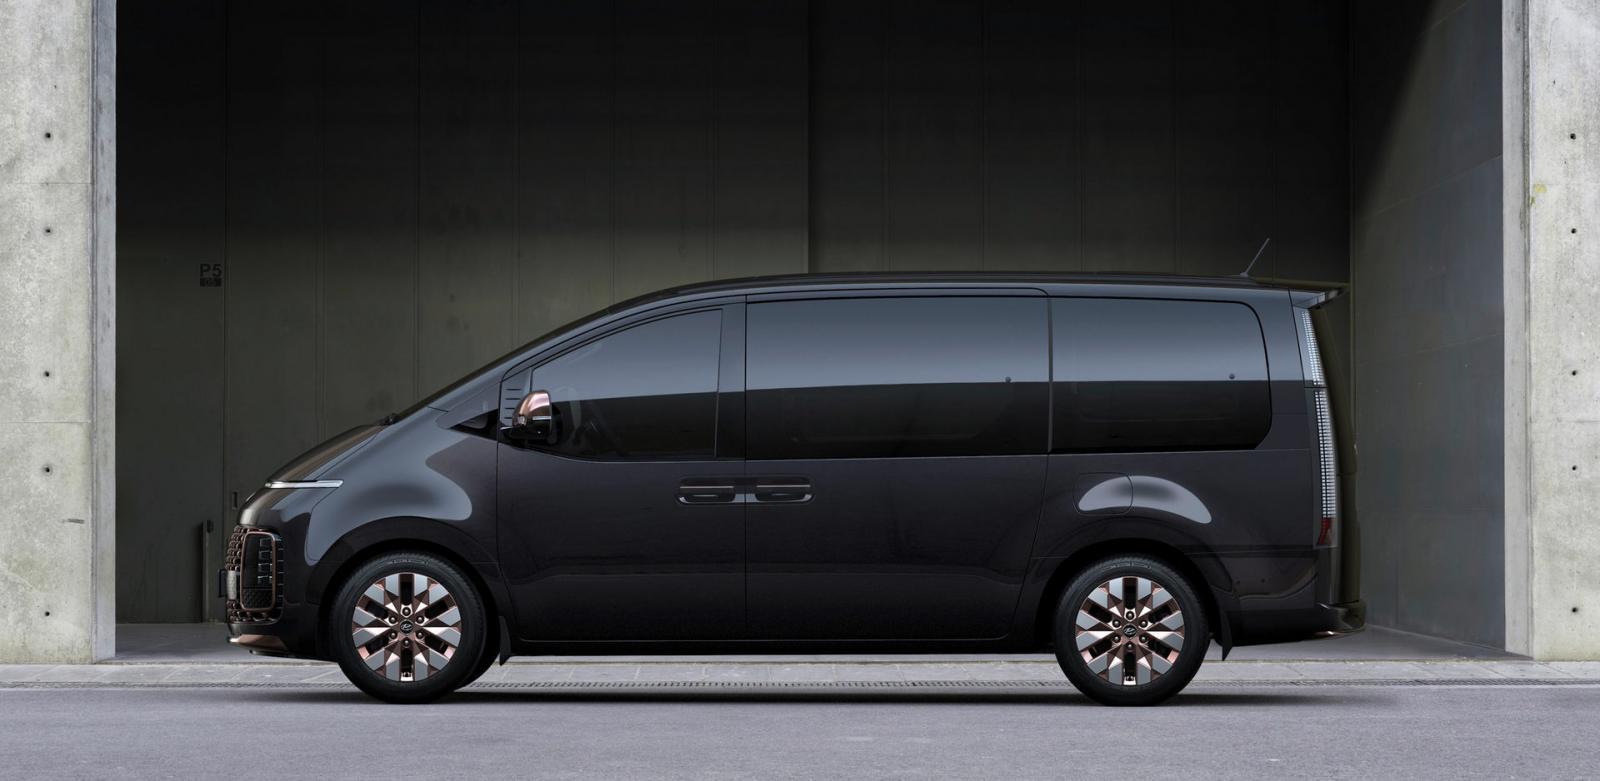 Hyundai Staria Revealed Ahead of Debut 5